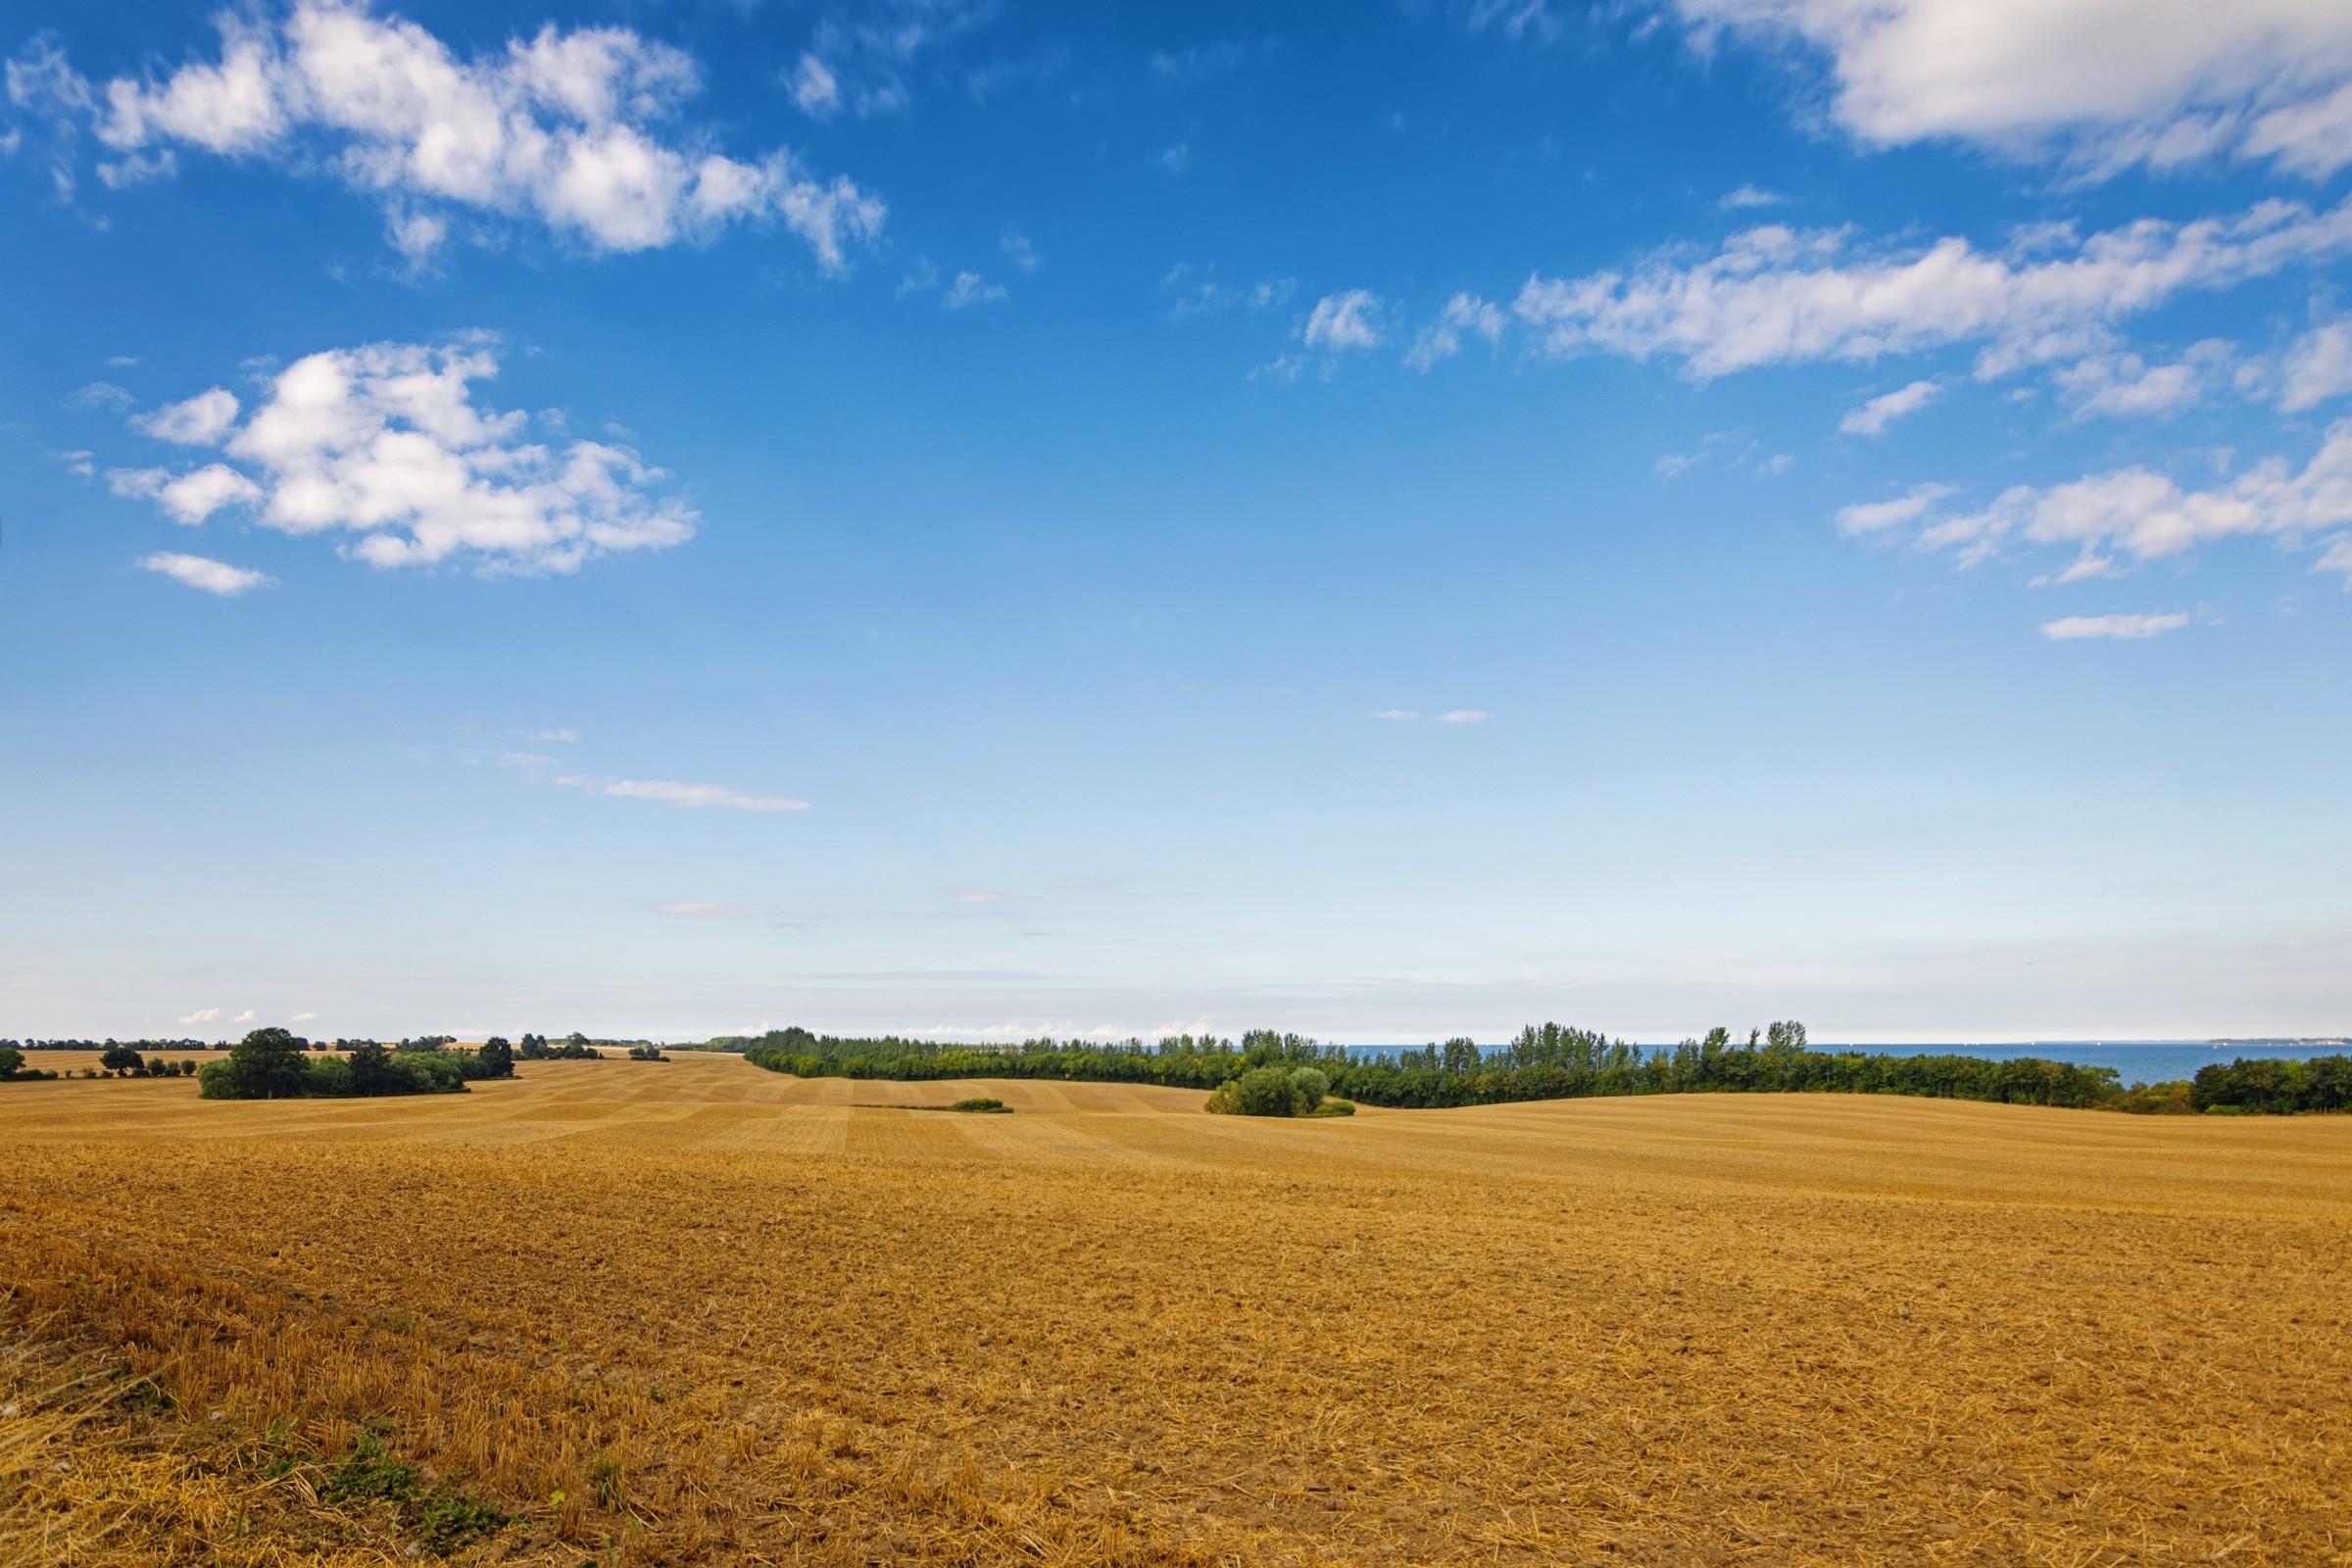 a field under a bright blue sky